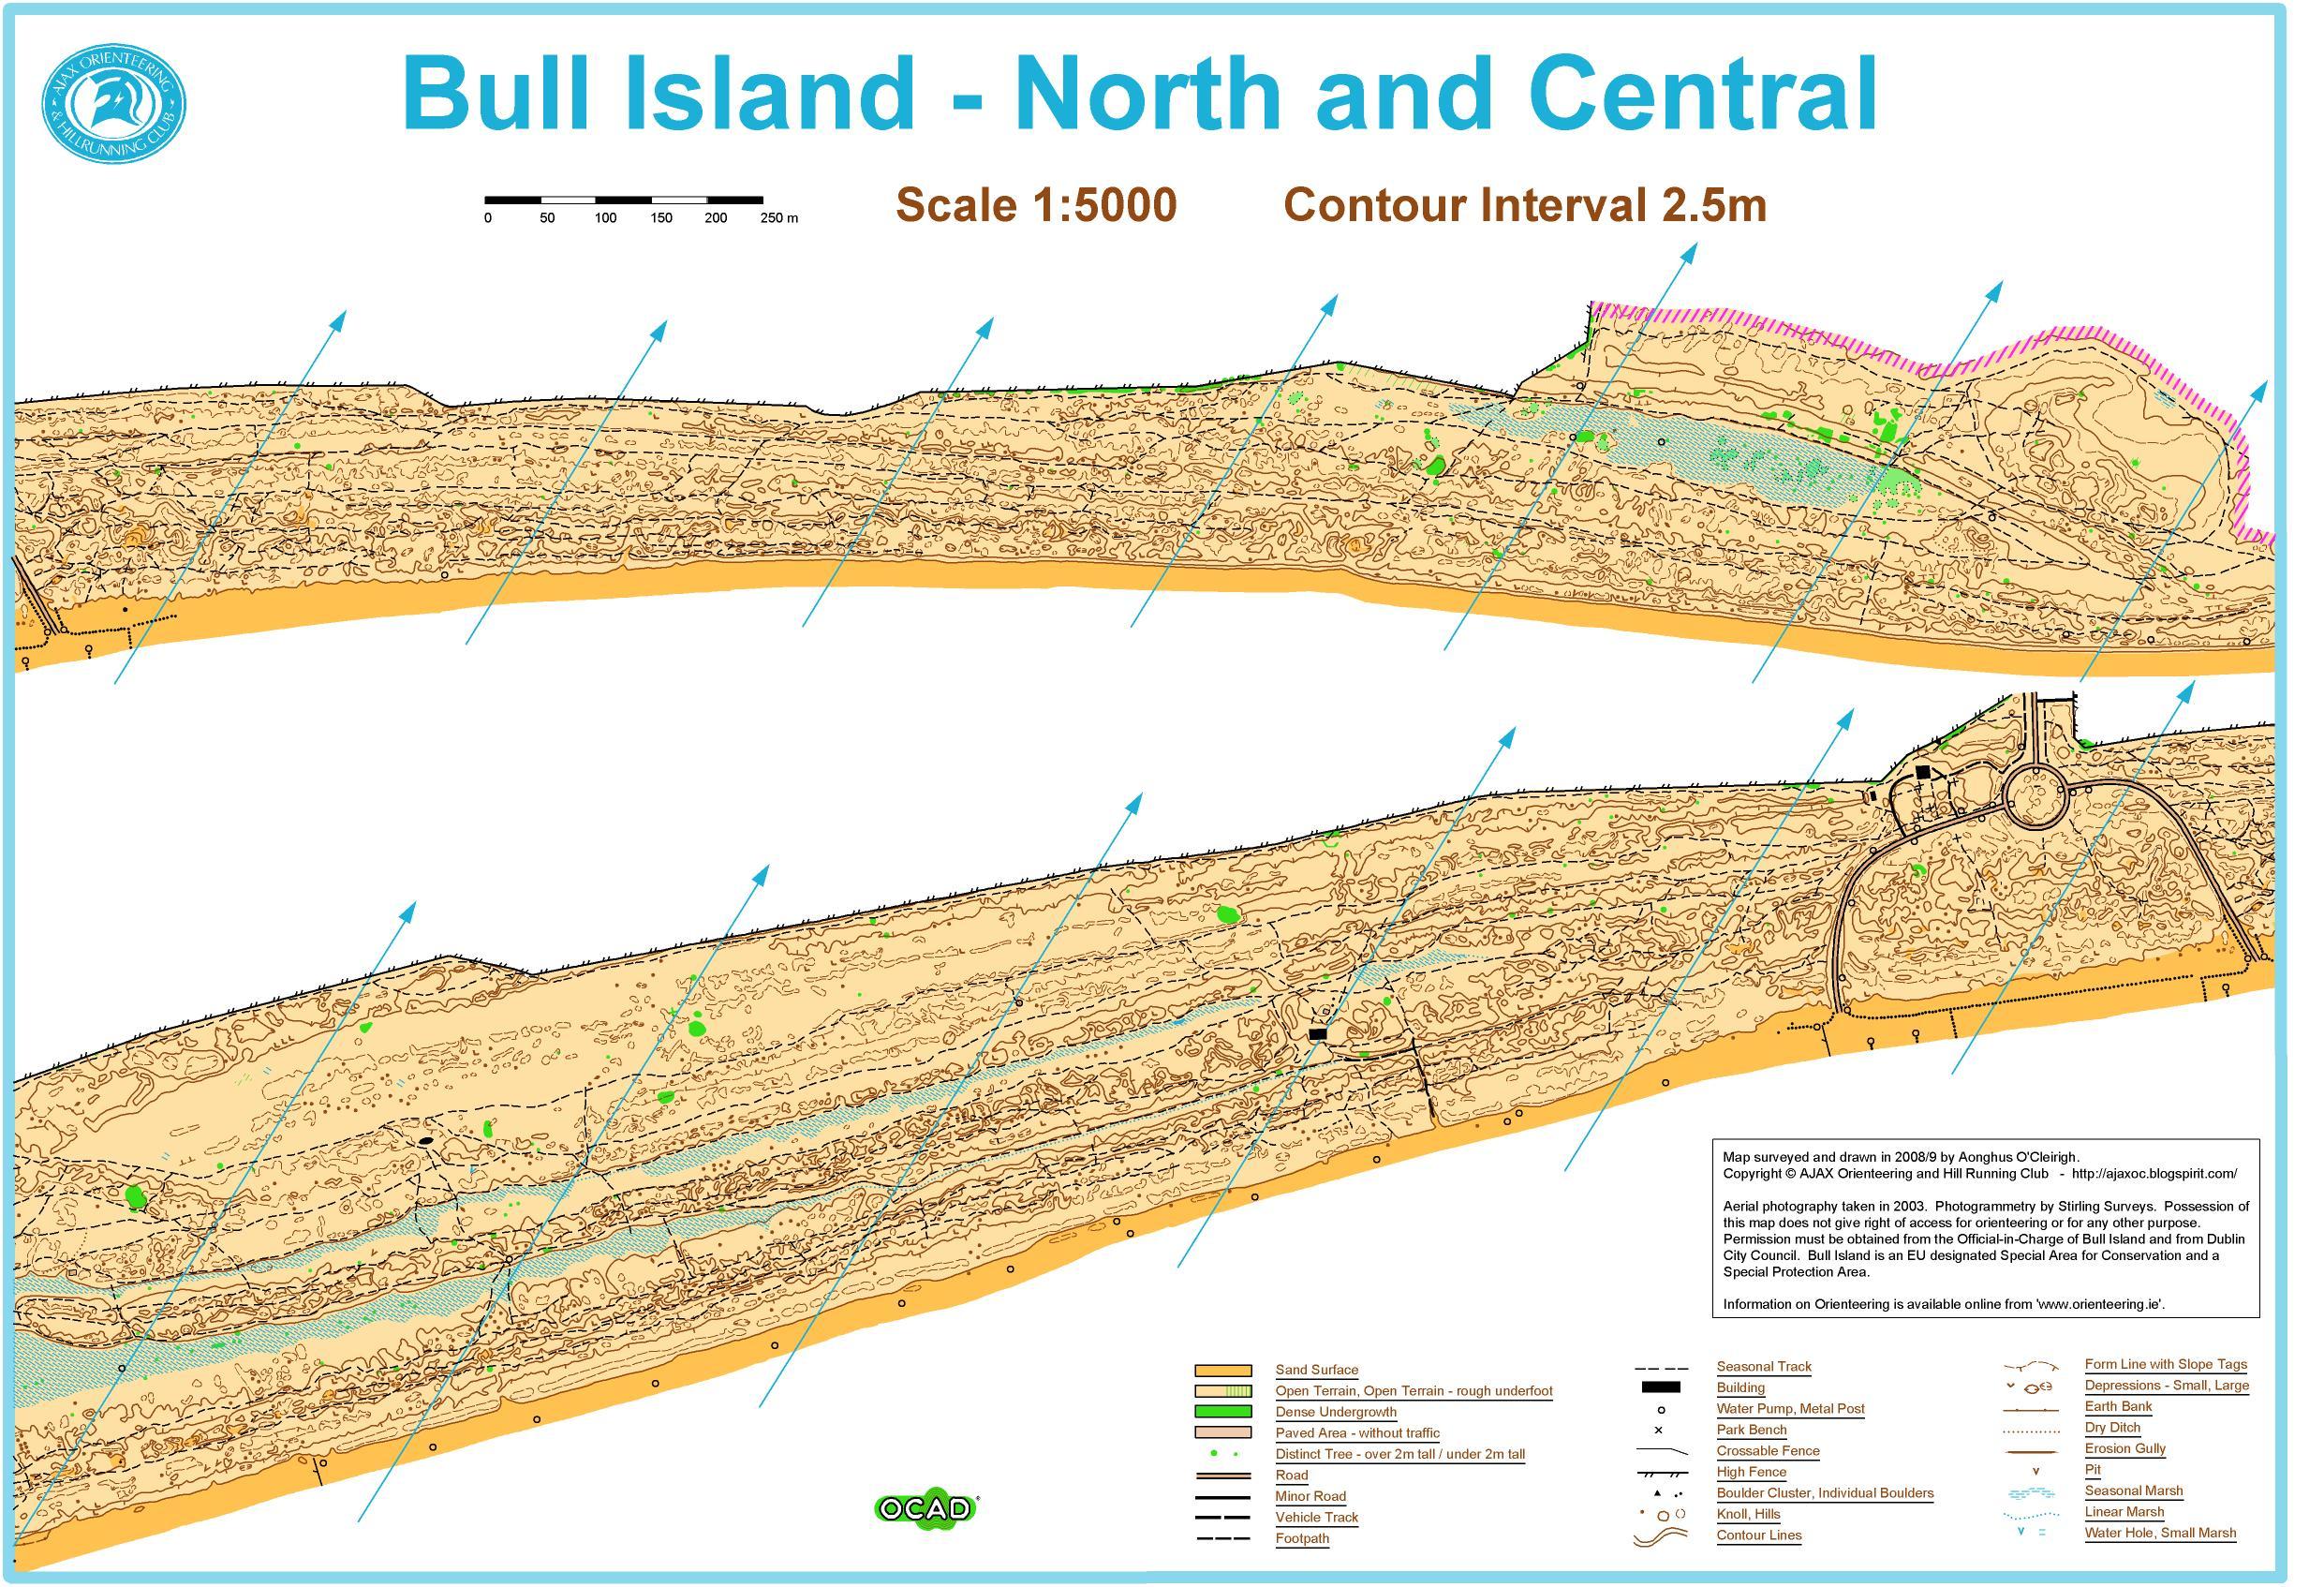 Bull Island orienteering